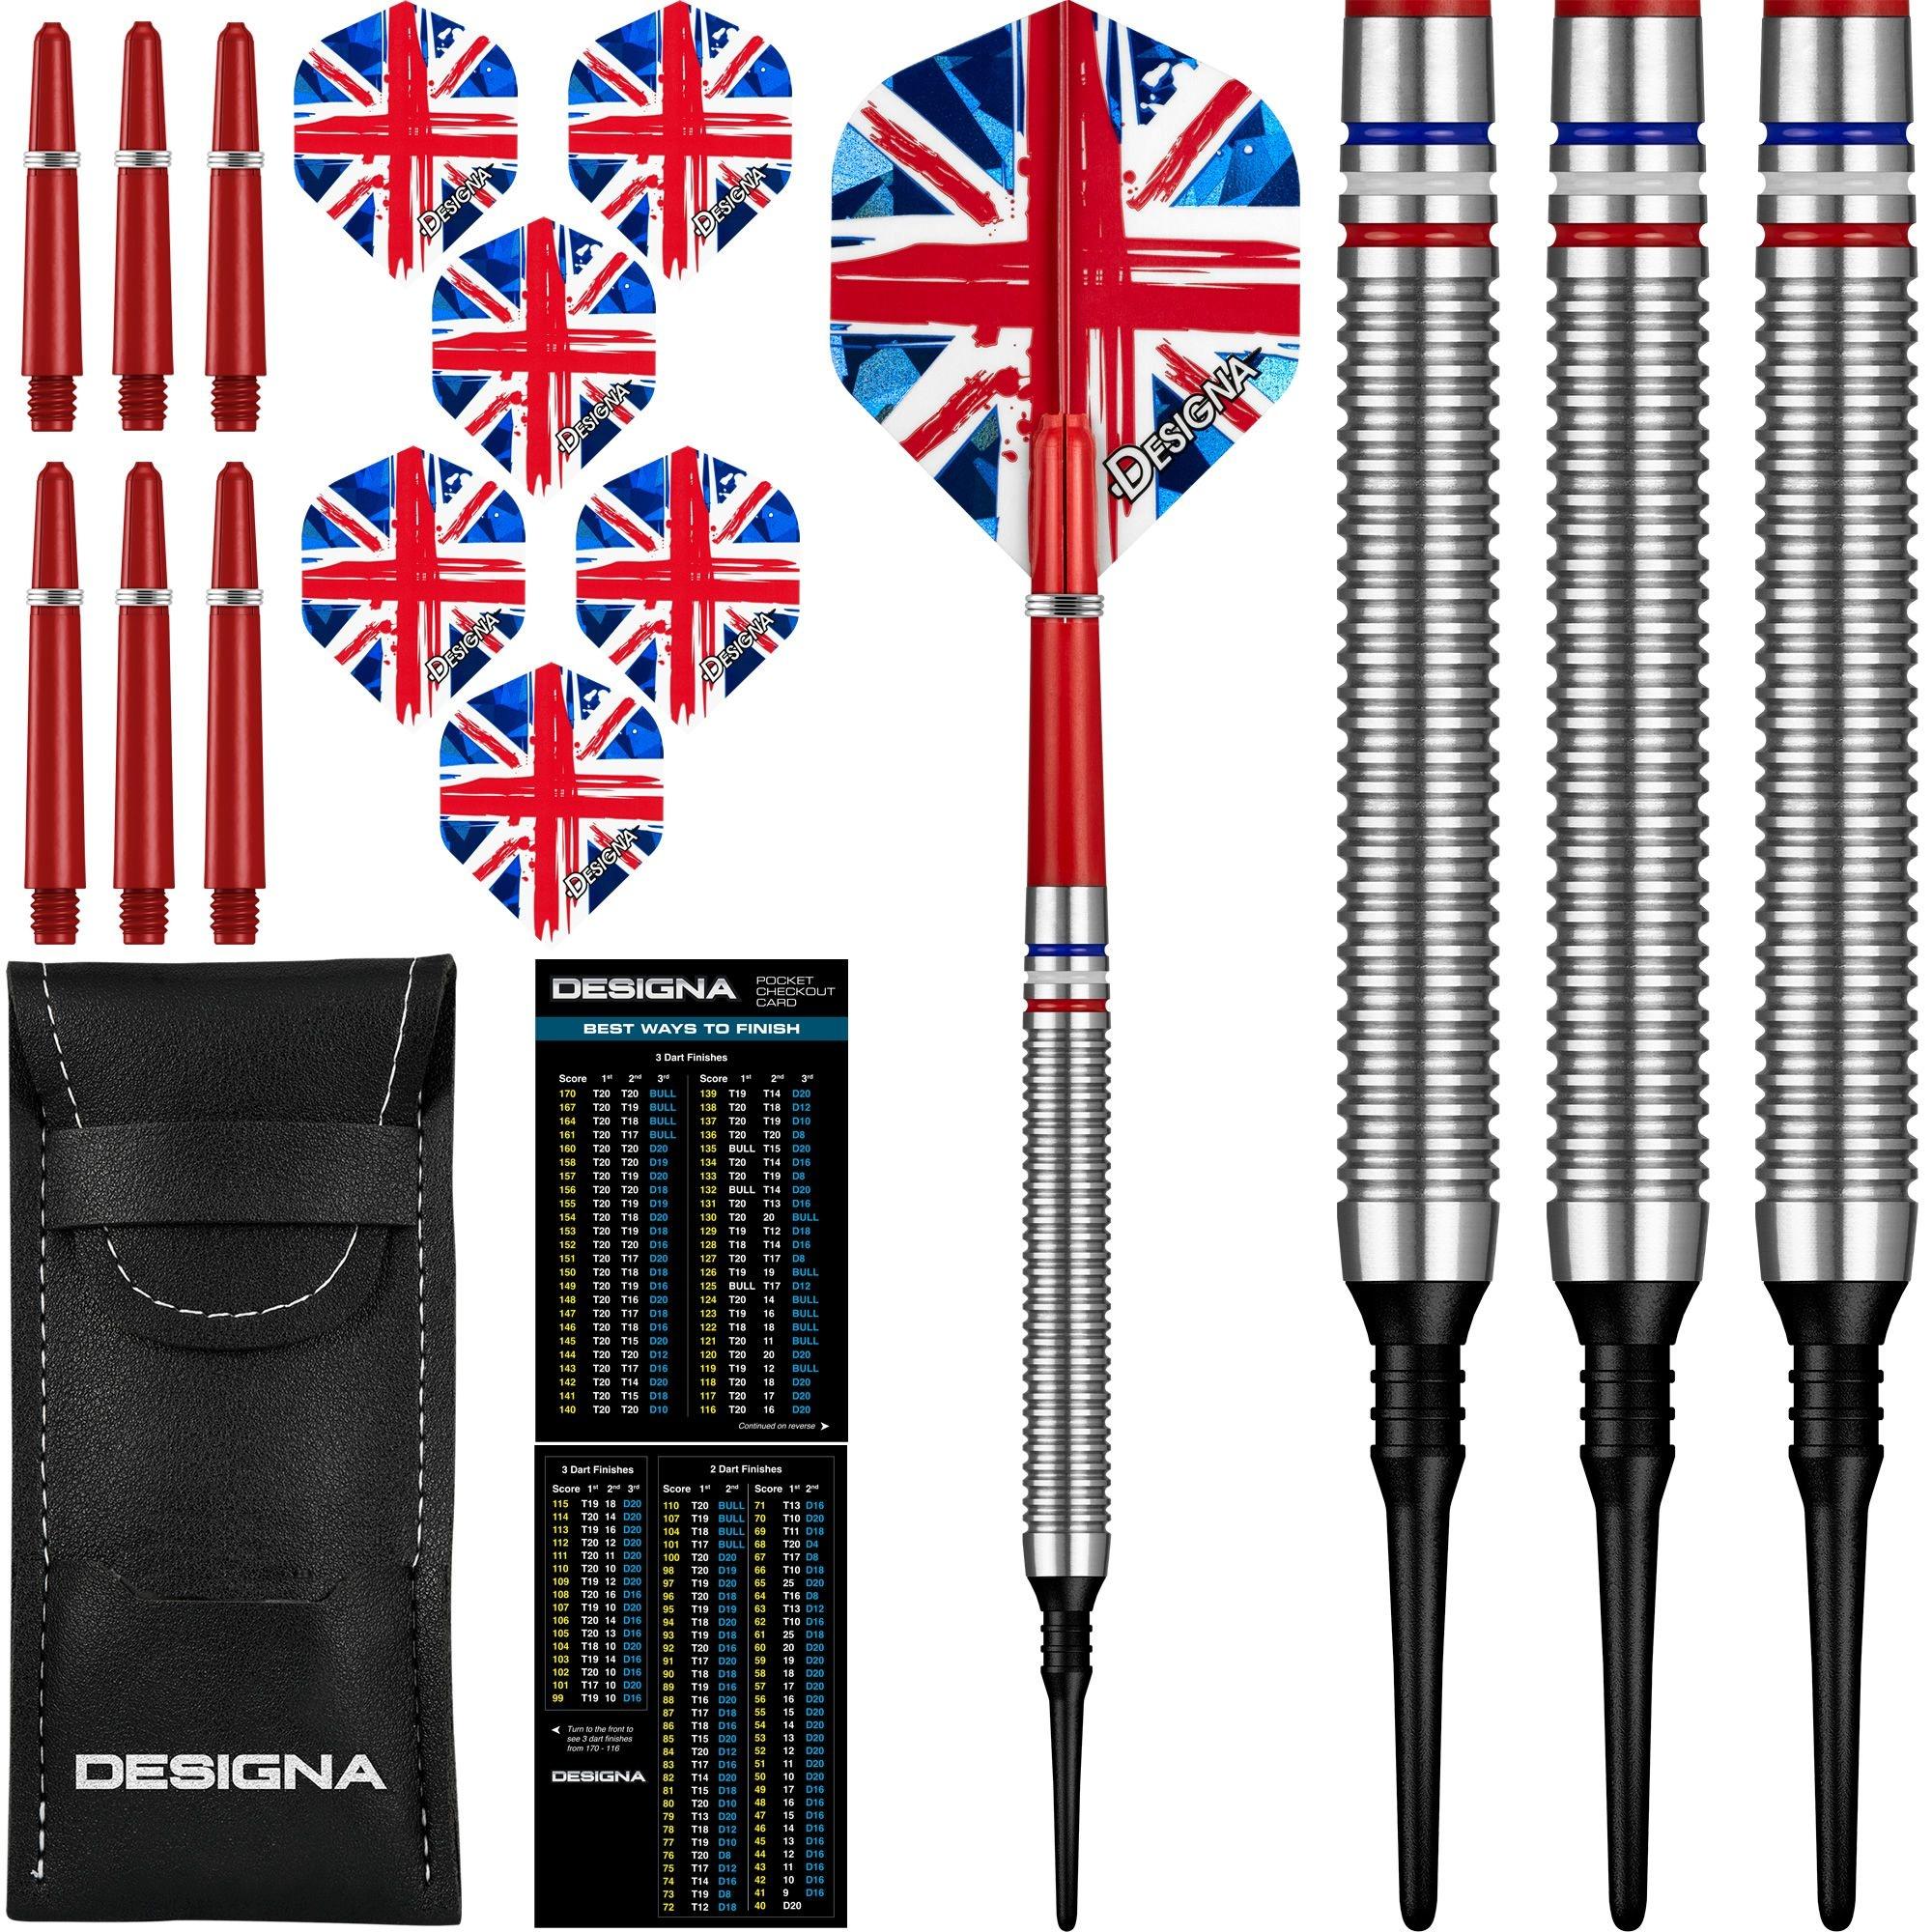 Patriot X Great Britain 90% Soft Tip